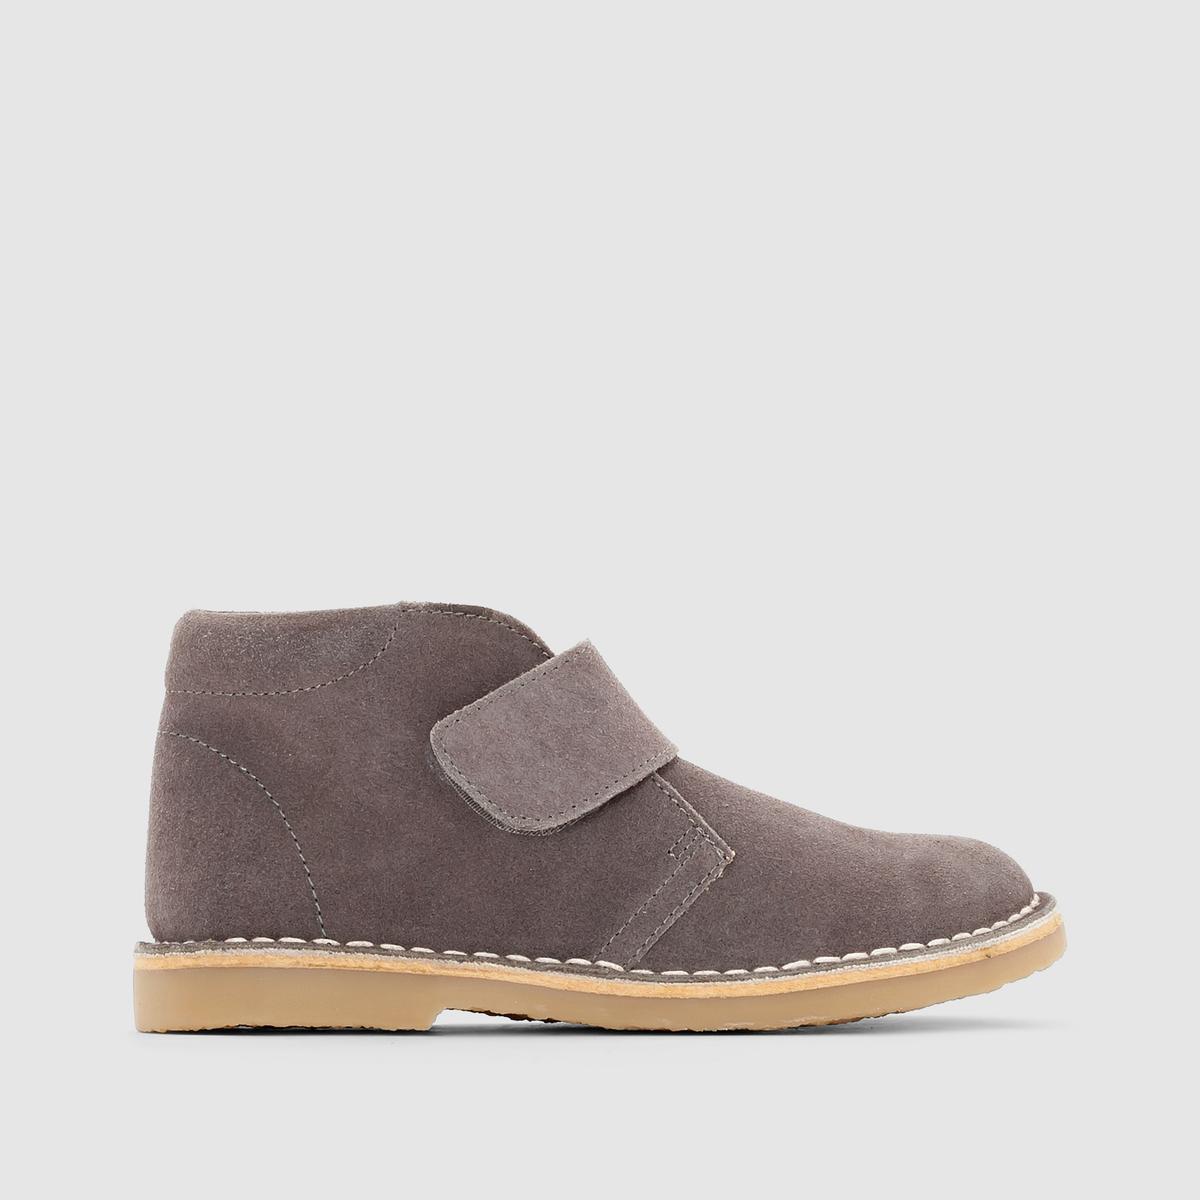 Ботинки из спилка 26-35 ботинки из спилка